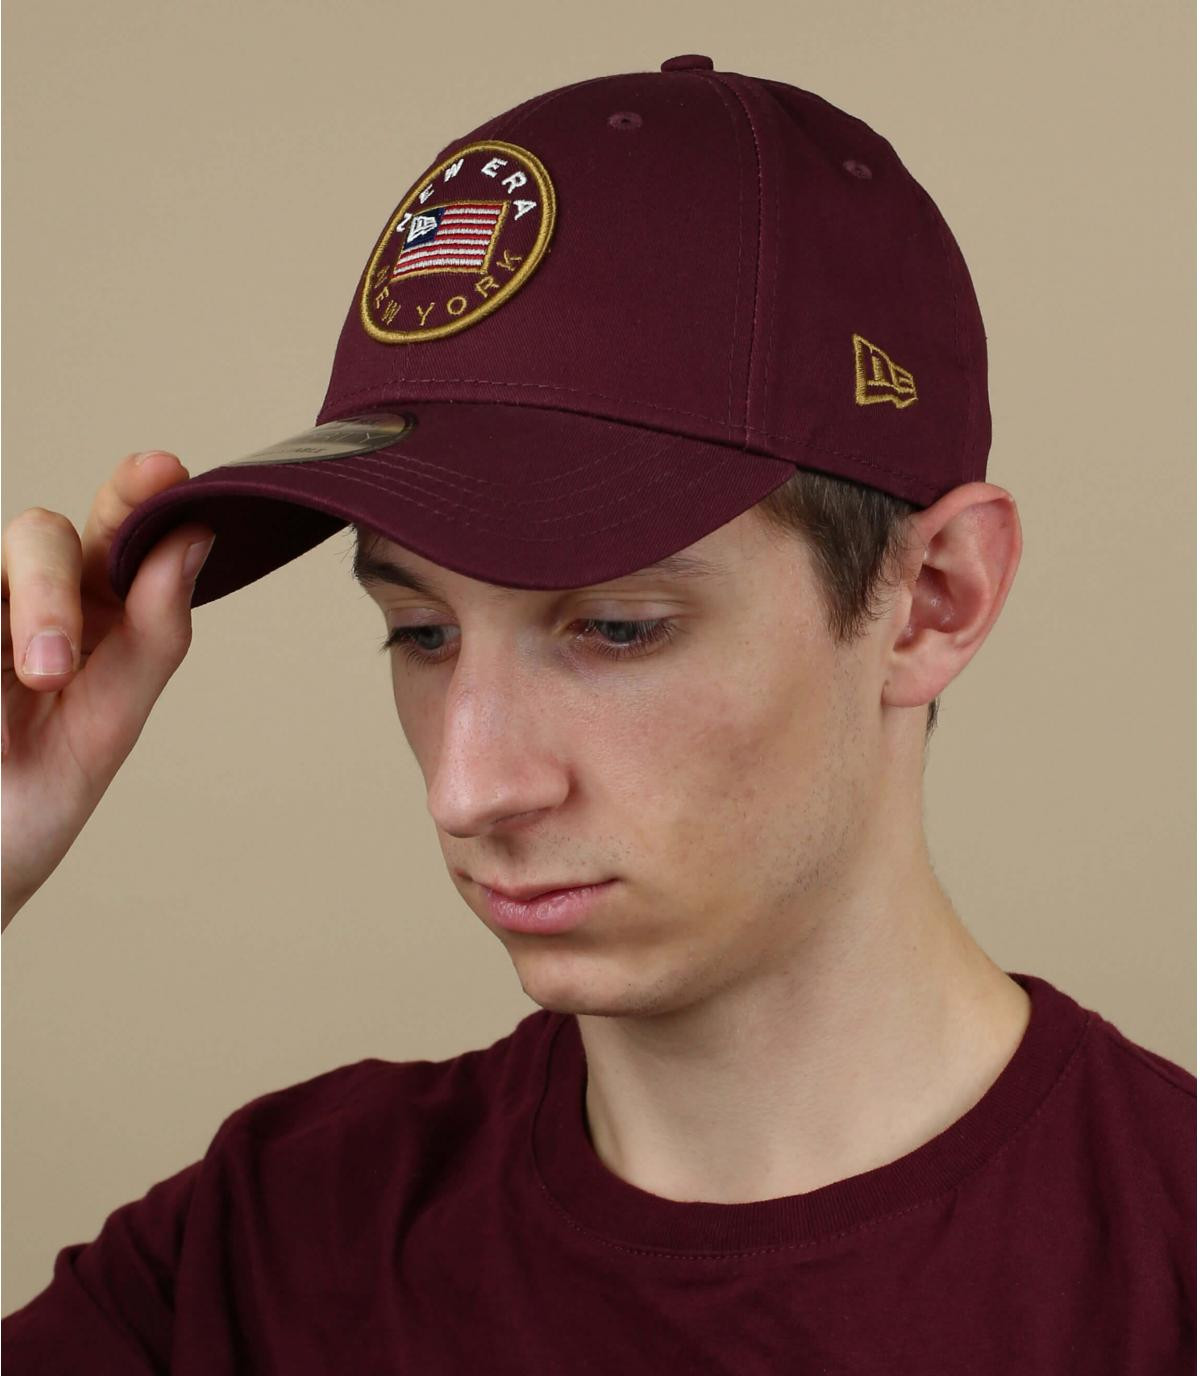 cappello bordeaux bandiera americana